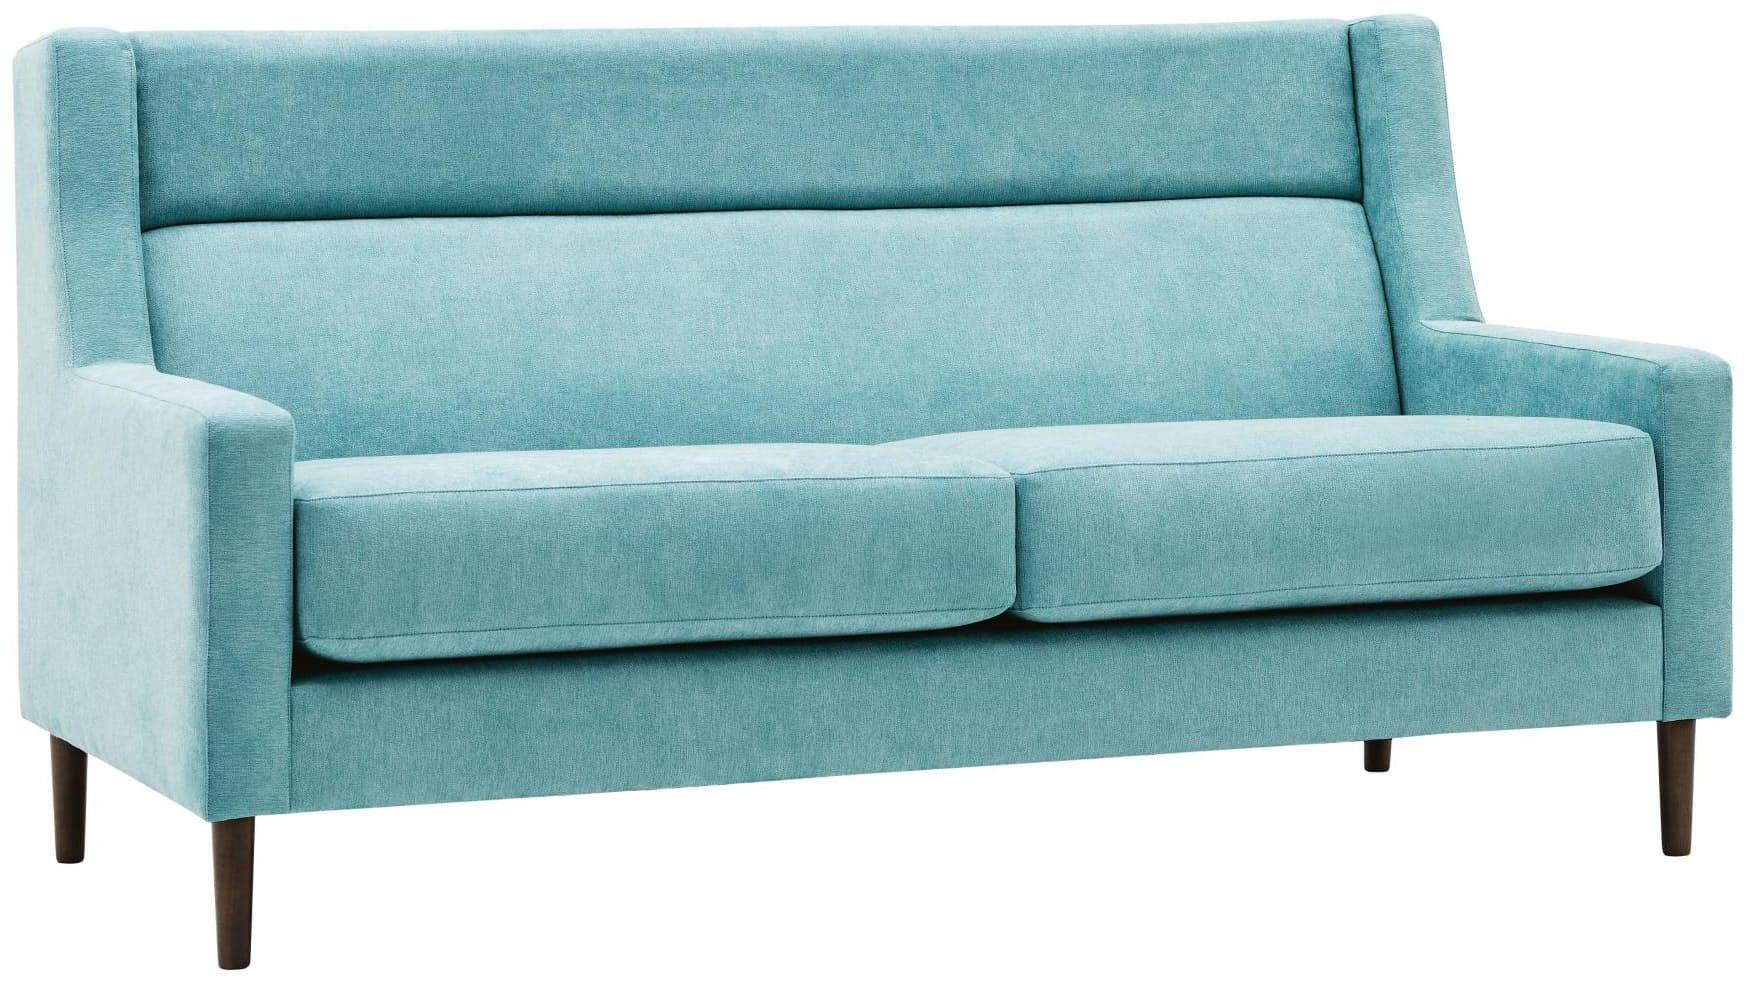 DOMAYNE Furniture, 5 seater sofa, Seater sofa